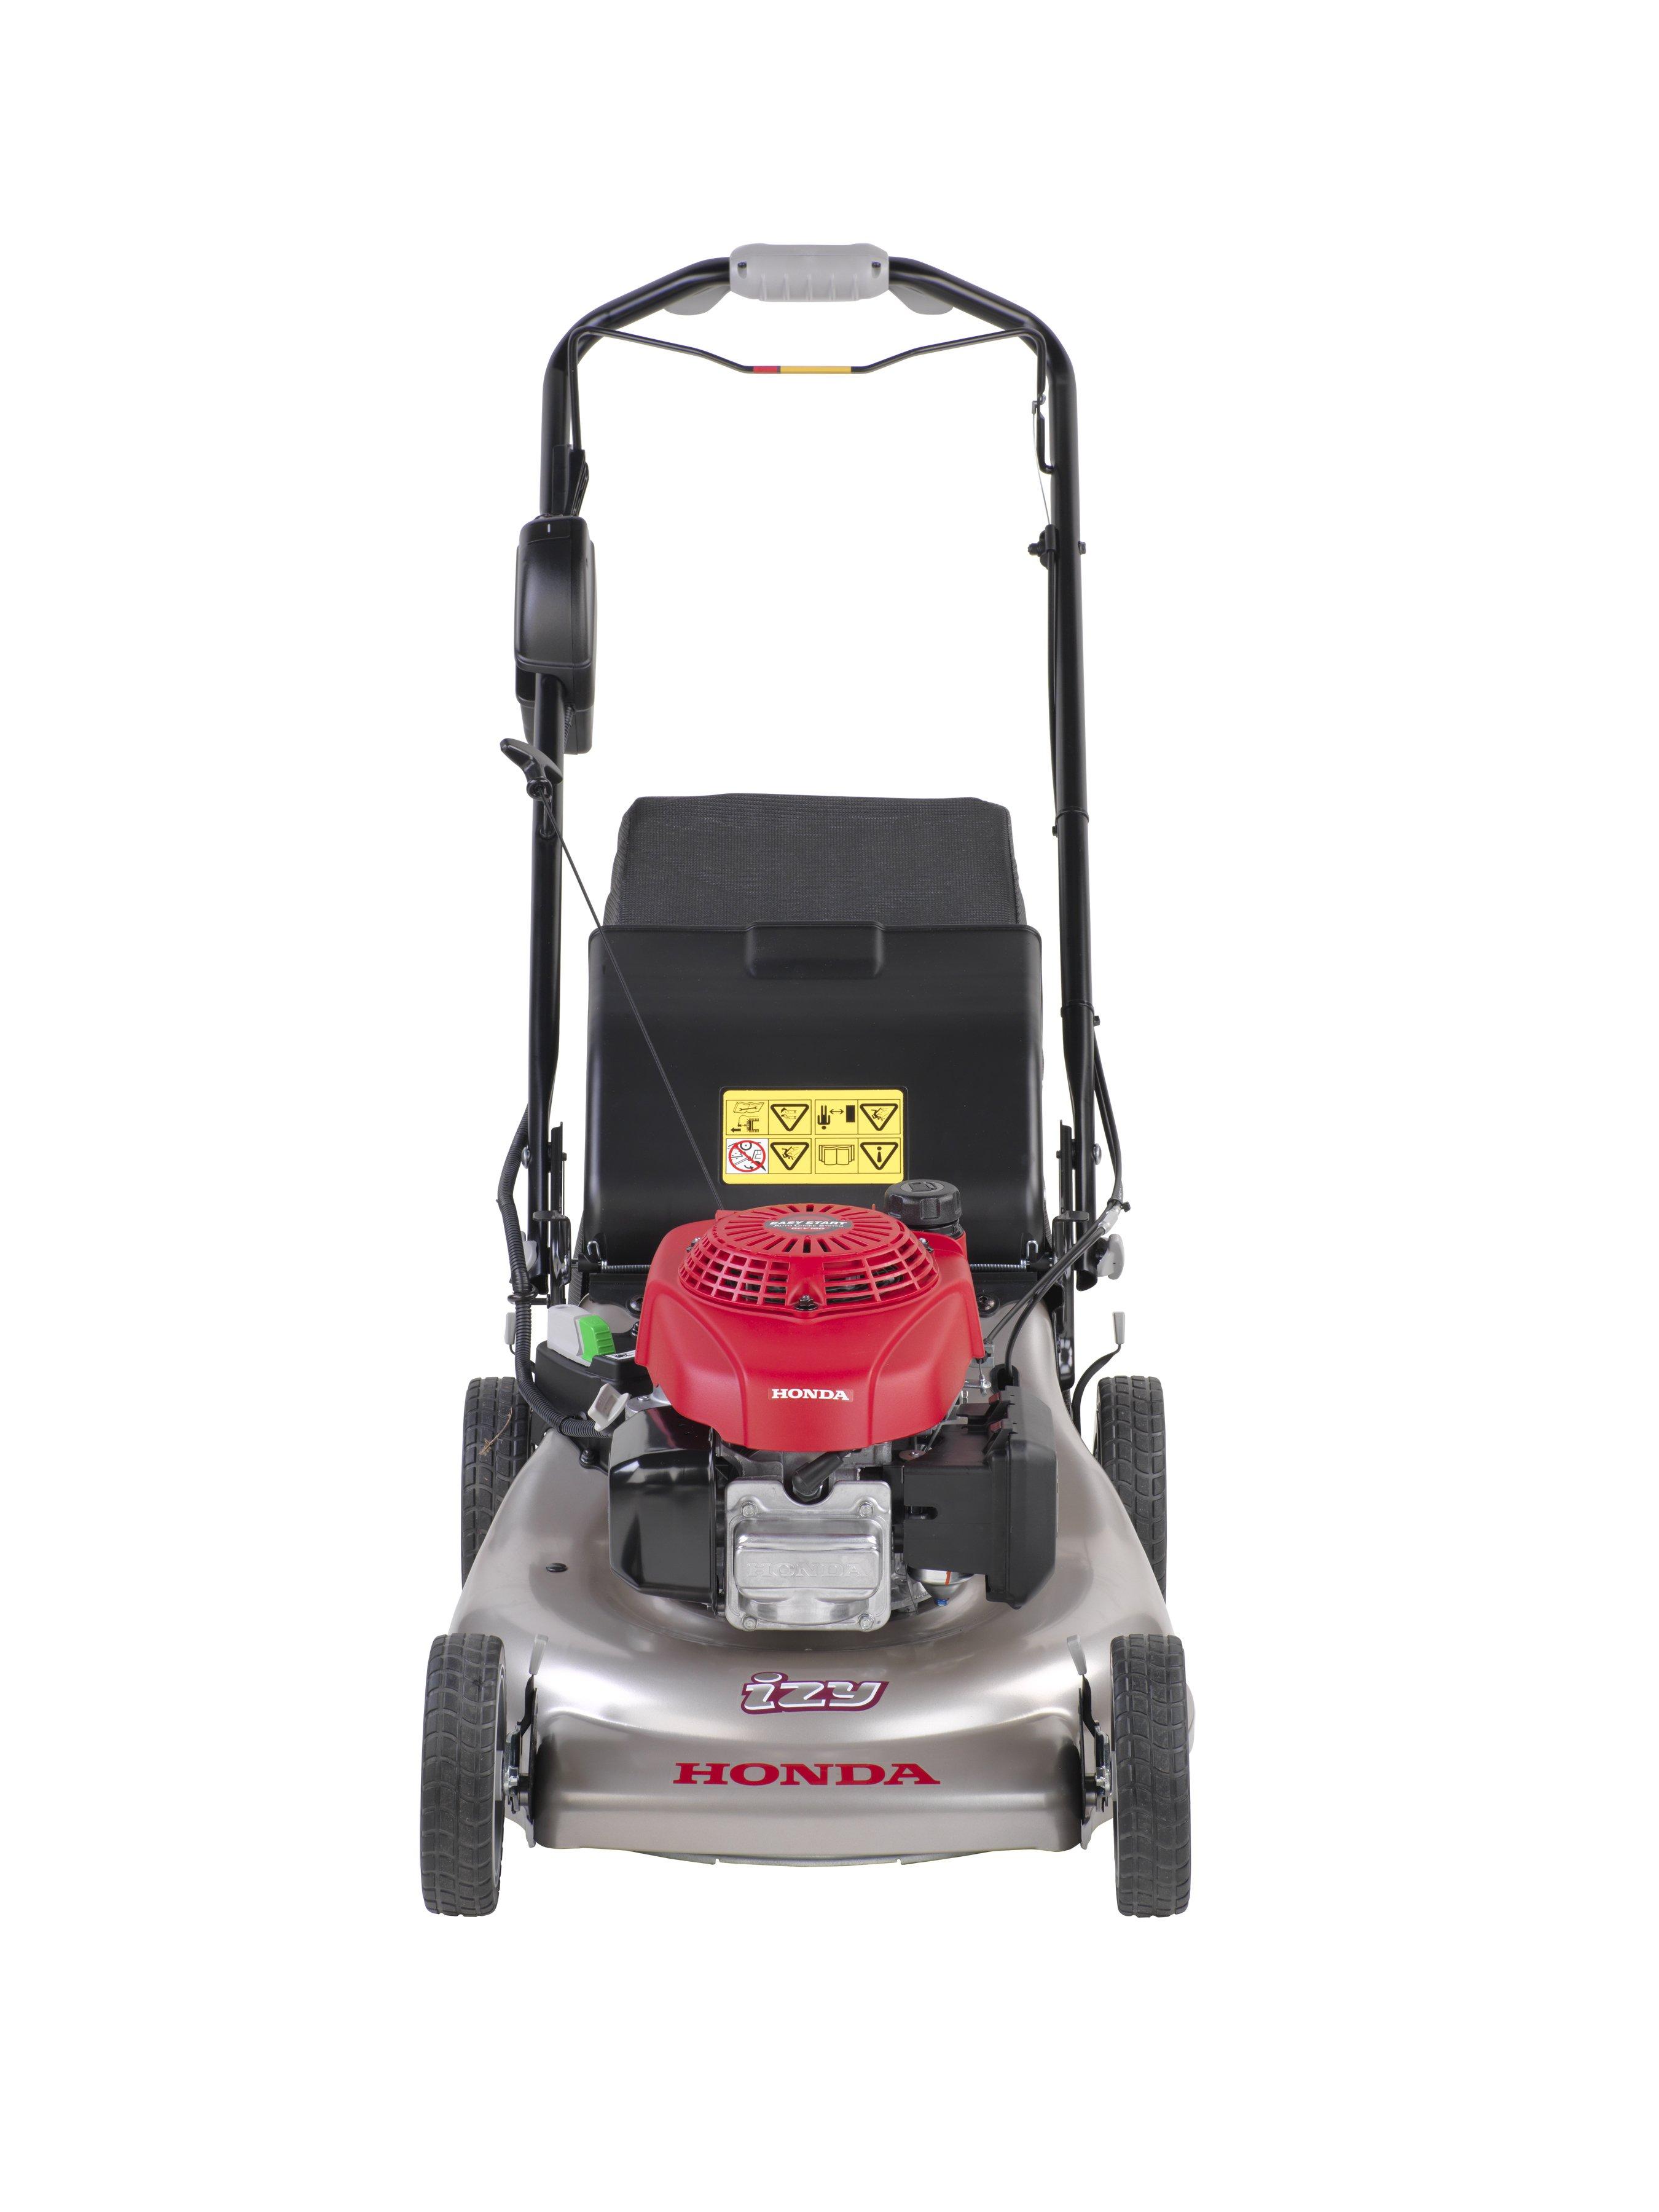 Honda garden mower